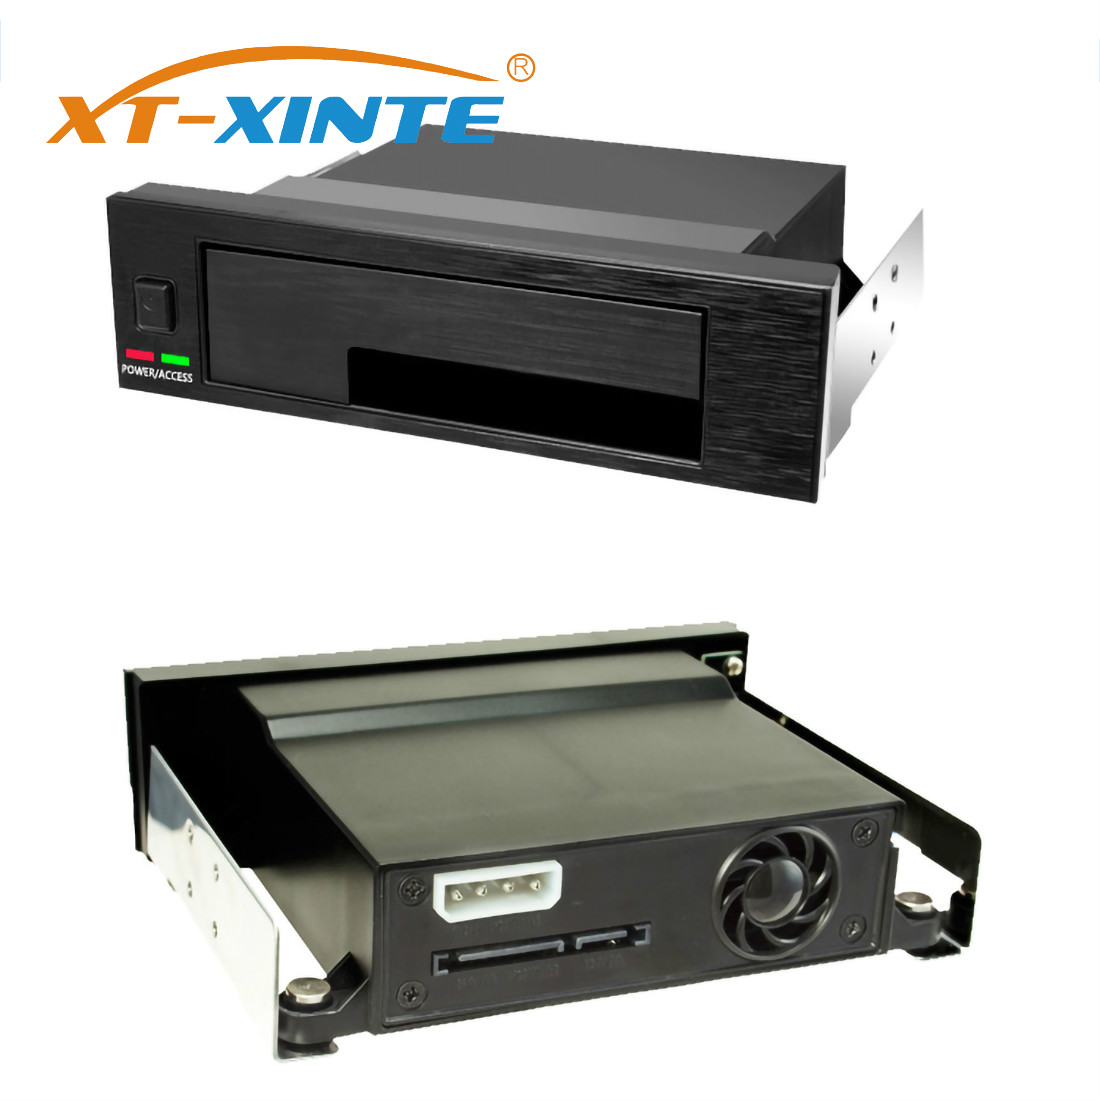 XT-XINTE SSD Storage Box Internal Single Bay Tray-Less Mobile Rack Enclosure LED Indicator Hot-swap For 2.5 3.5 Inch SATA